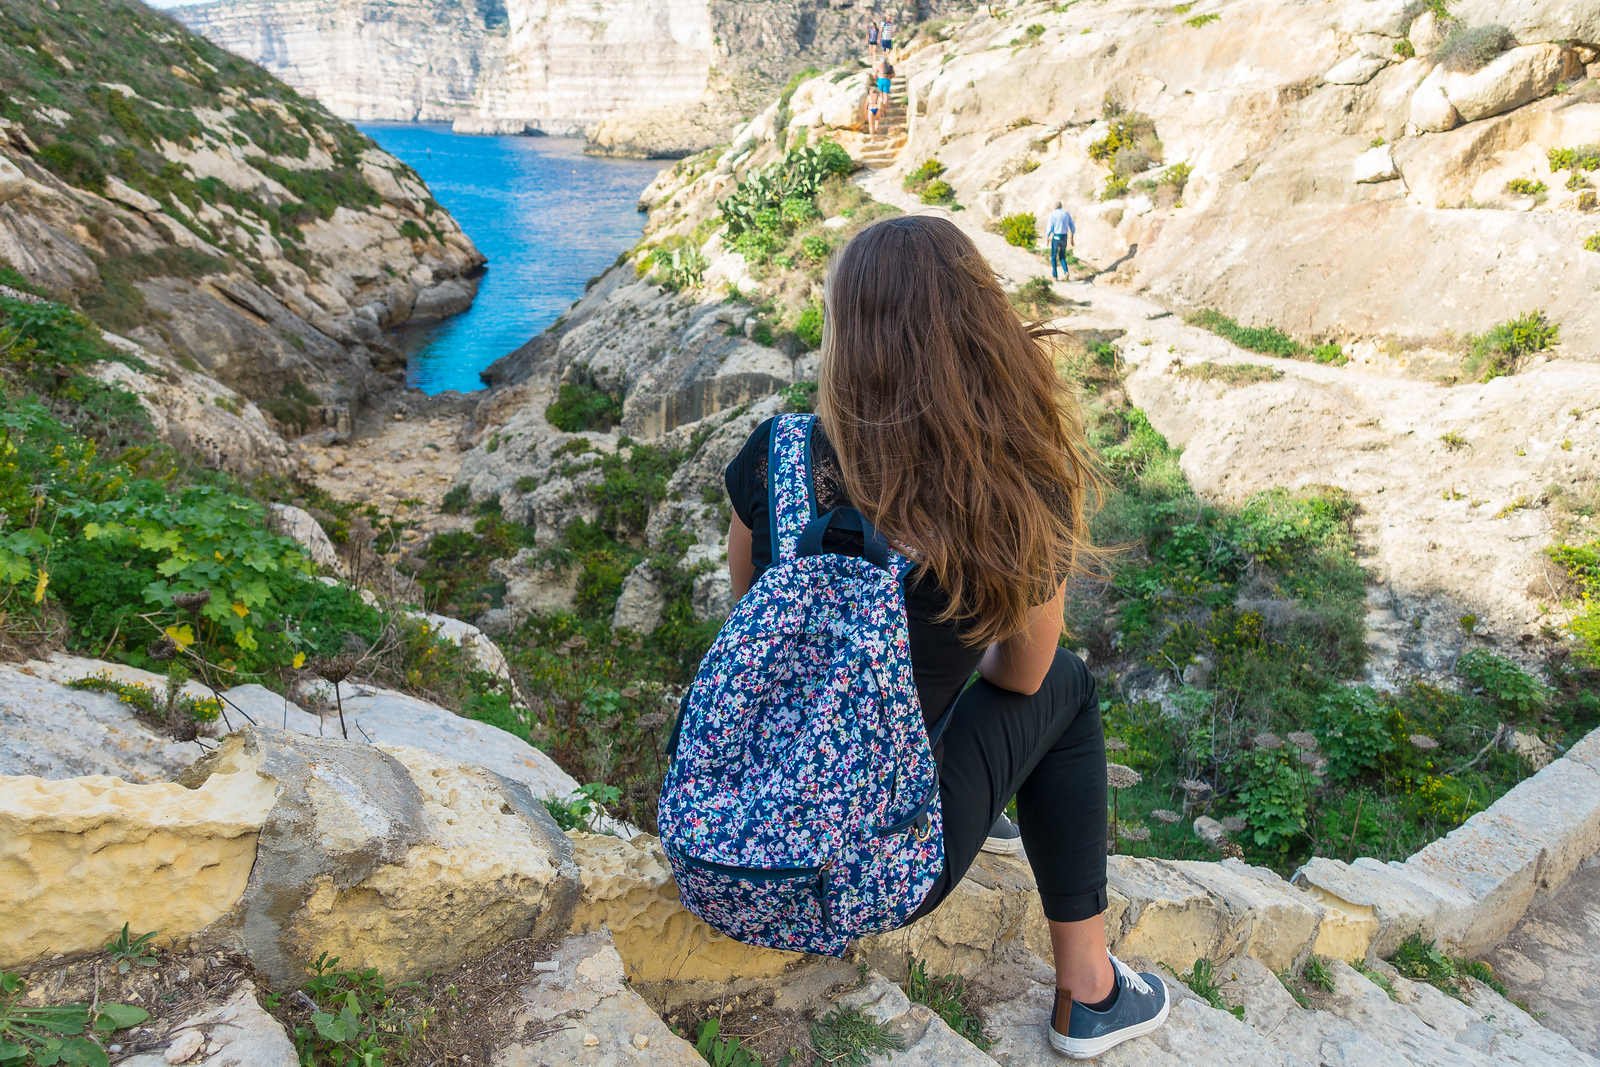 Digital Nomad in Malta. Activities in Malta